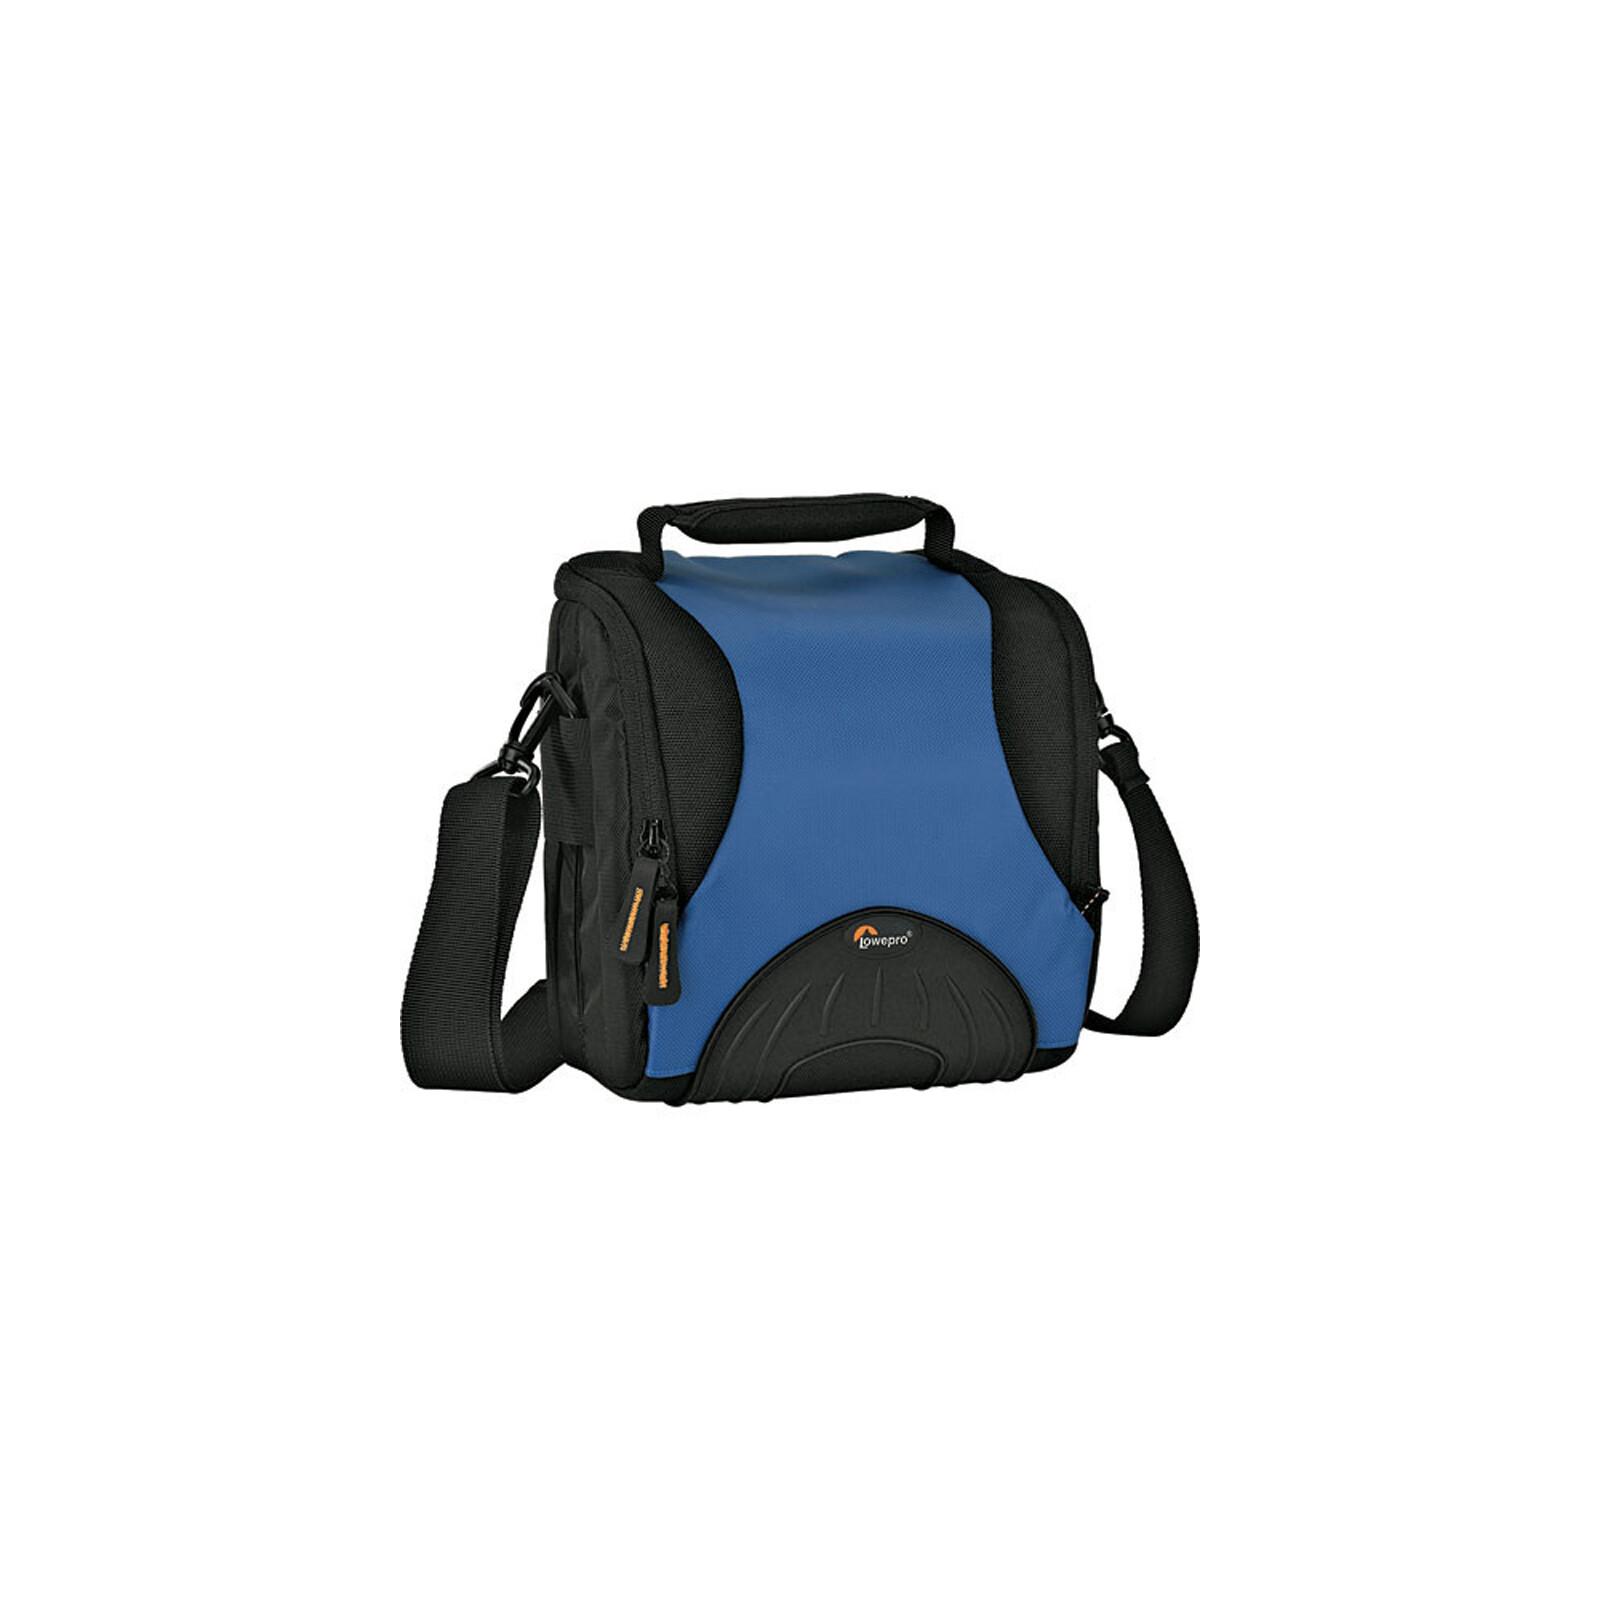 Lowepro Apex 140 AW blau